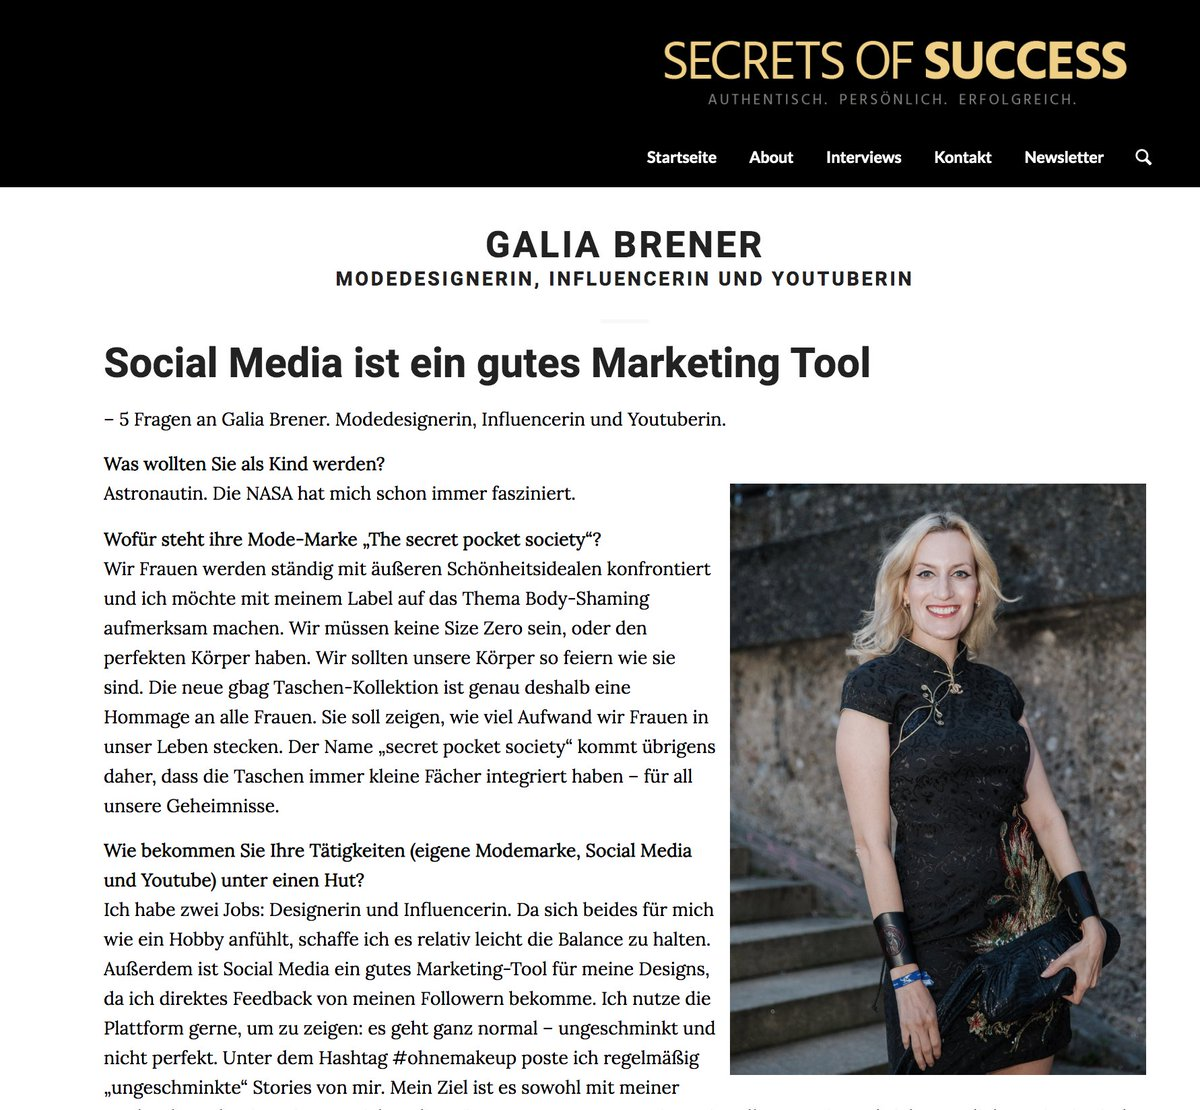 Congratulations Sören Bauer on your new magazine! It's an honor for me to be in your first publication http://www.secrets-of-success.de/social-media-ist-ein-gutes-market……  #MovieMeetsMedia #SecretsOfSuccess • Werbung •pic.twitter.com/6KTEWlCT55